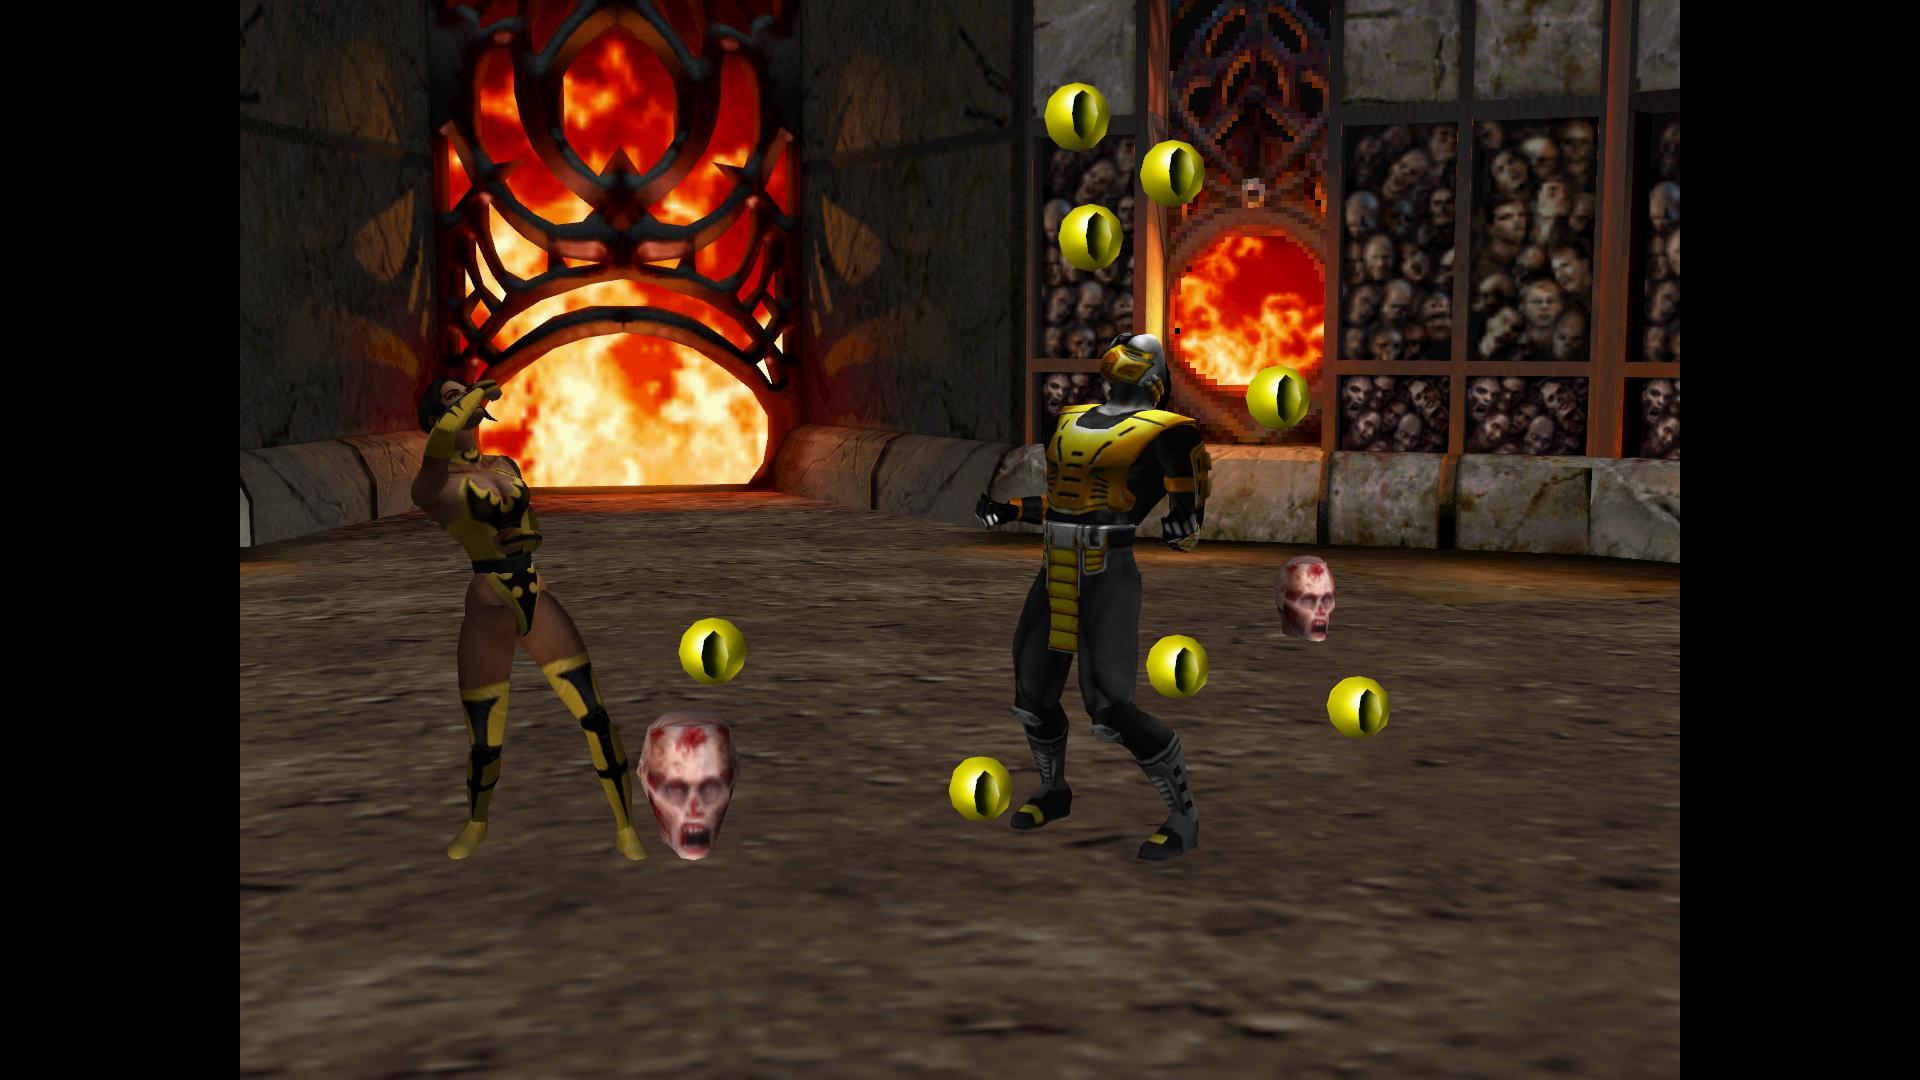 Mortal Kombat Gold (Dreamcast) - TFG Review